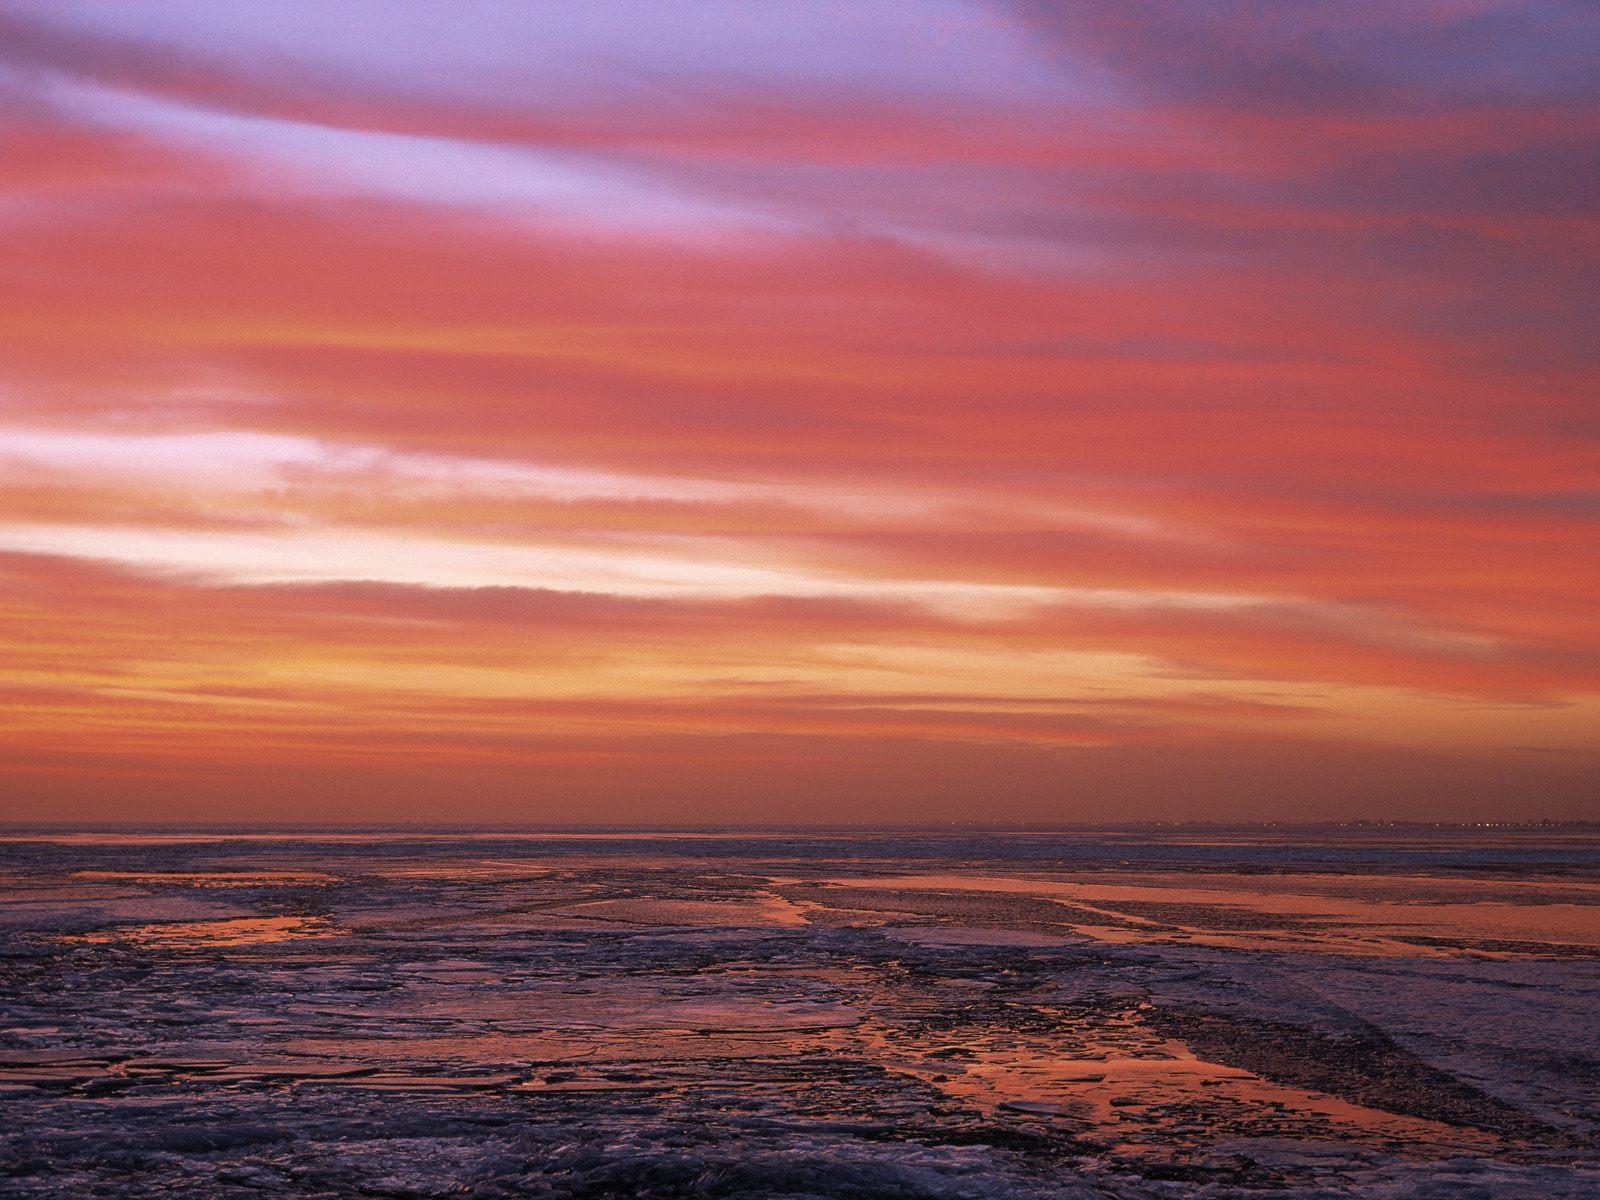 wallpaper  sunset on frozen lake marken the netherlands